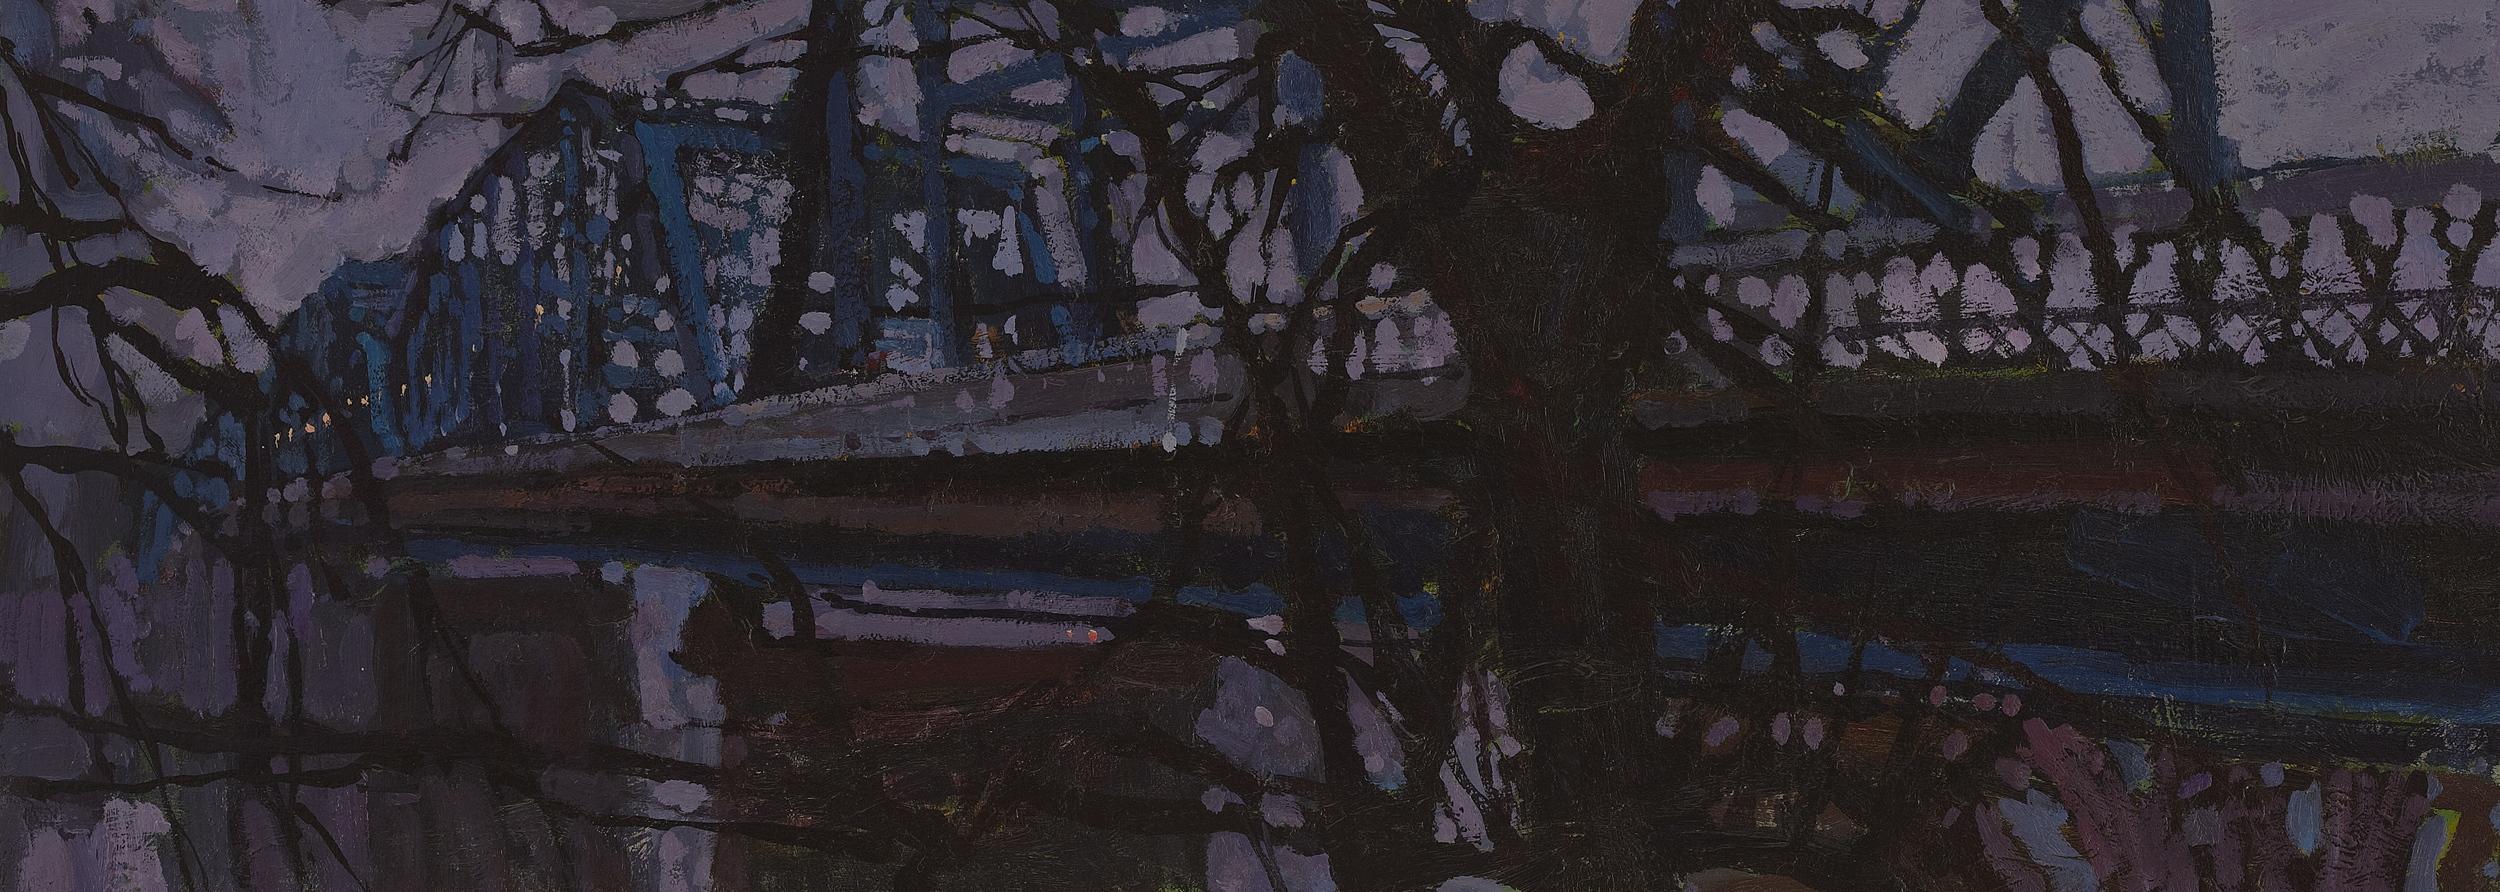 "Timur Akhriev  Title: Walnut St Bridge in the Rain.  7"" x 20"", Oil on Board, 2014. Framed  Available Through Lovetts Gallery"